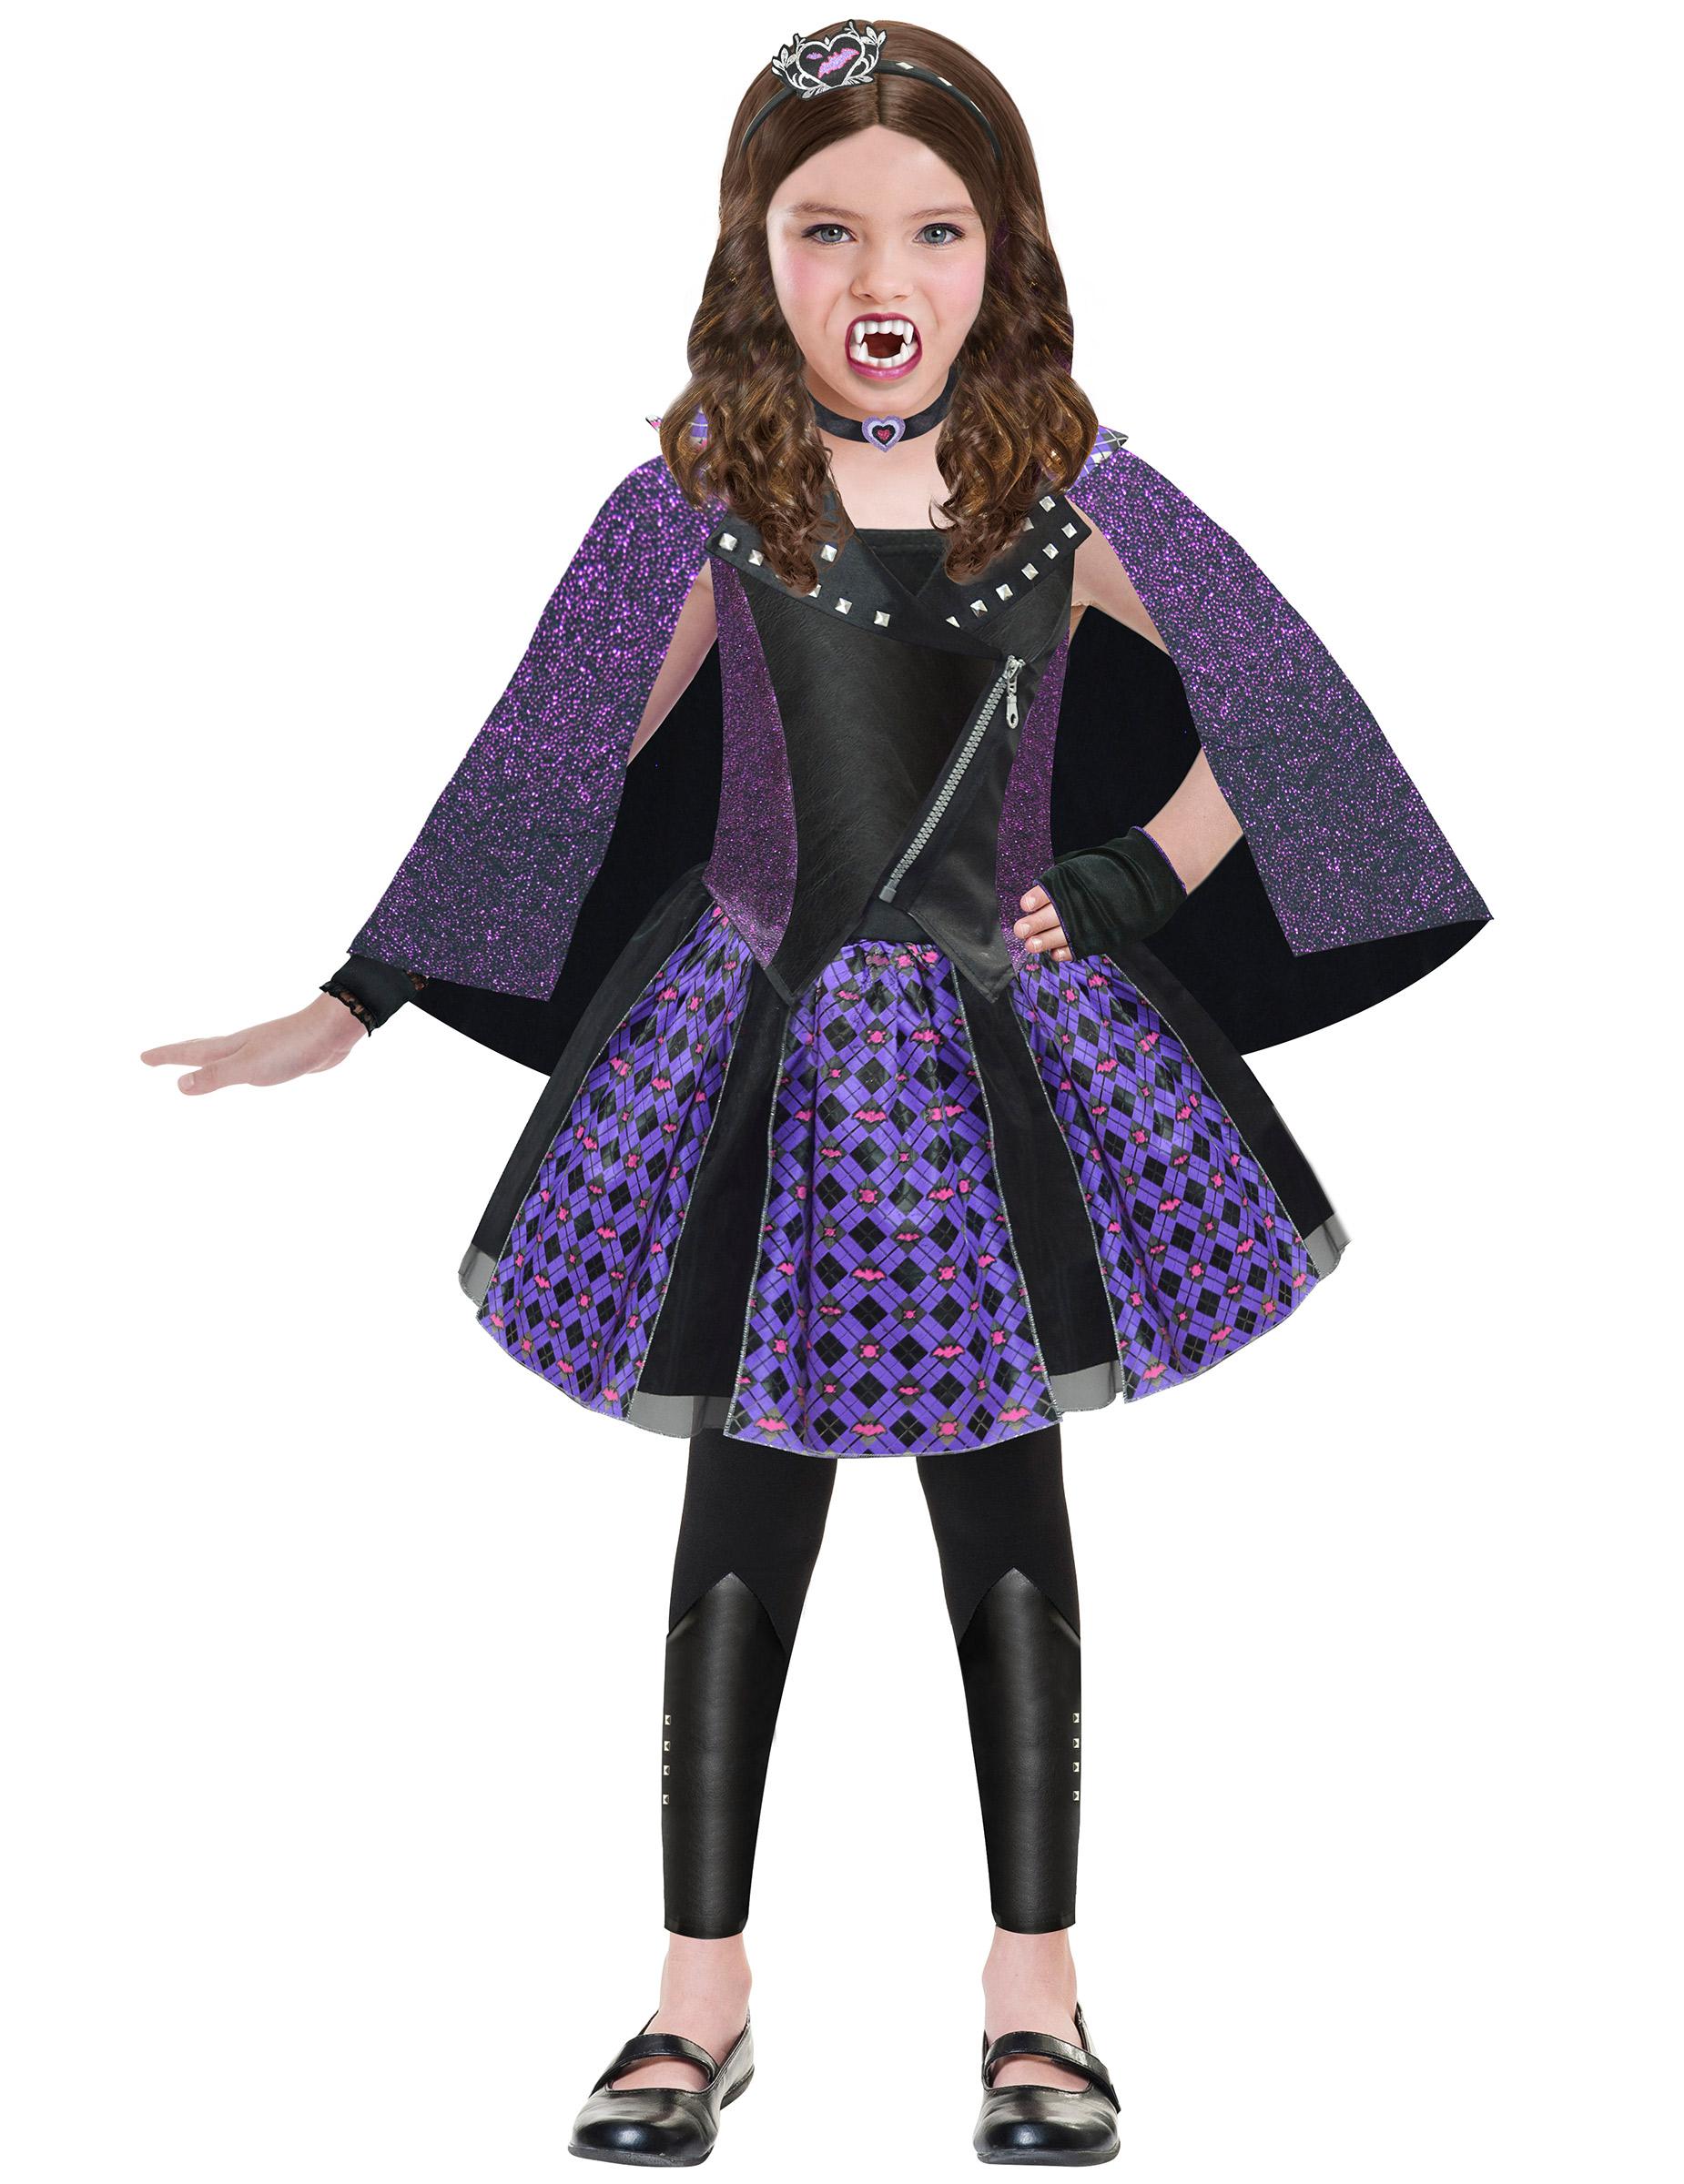 D guisement chica vampiro fille deguise toi achat de d guisements enfants - Deguisement en o ...